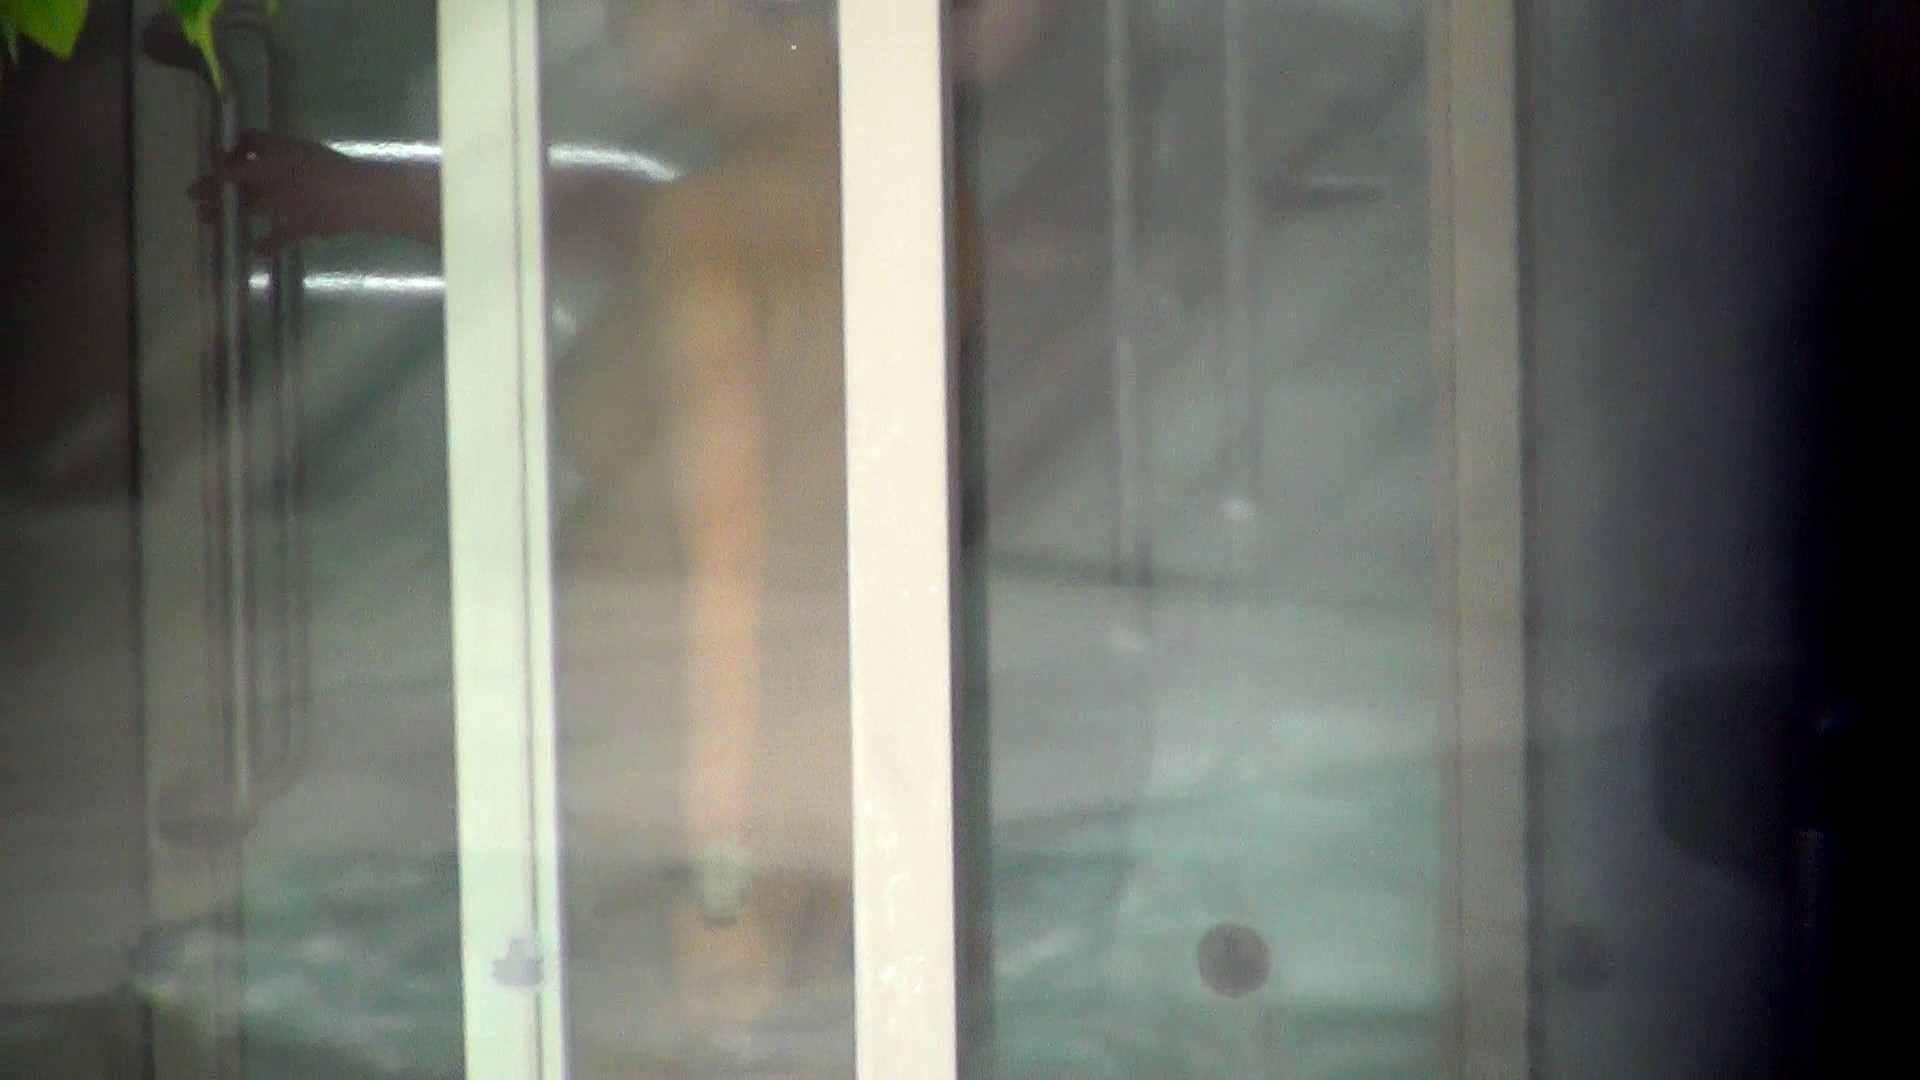 Aquaな露天風呂Vol.279 OLセックス 覗きオメコ動画キャプチャ 77画像 14